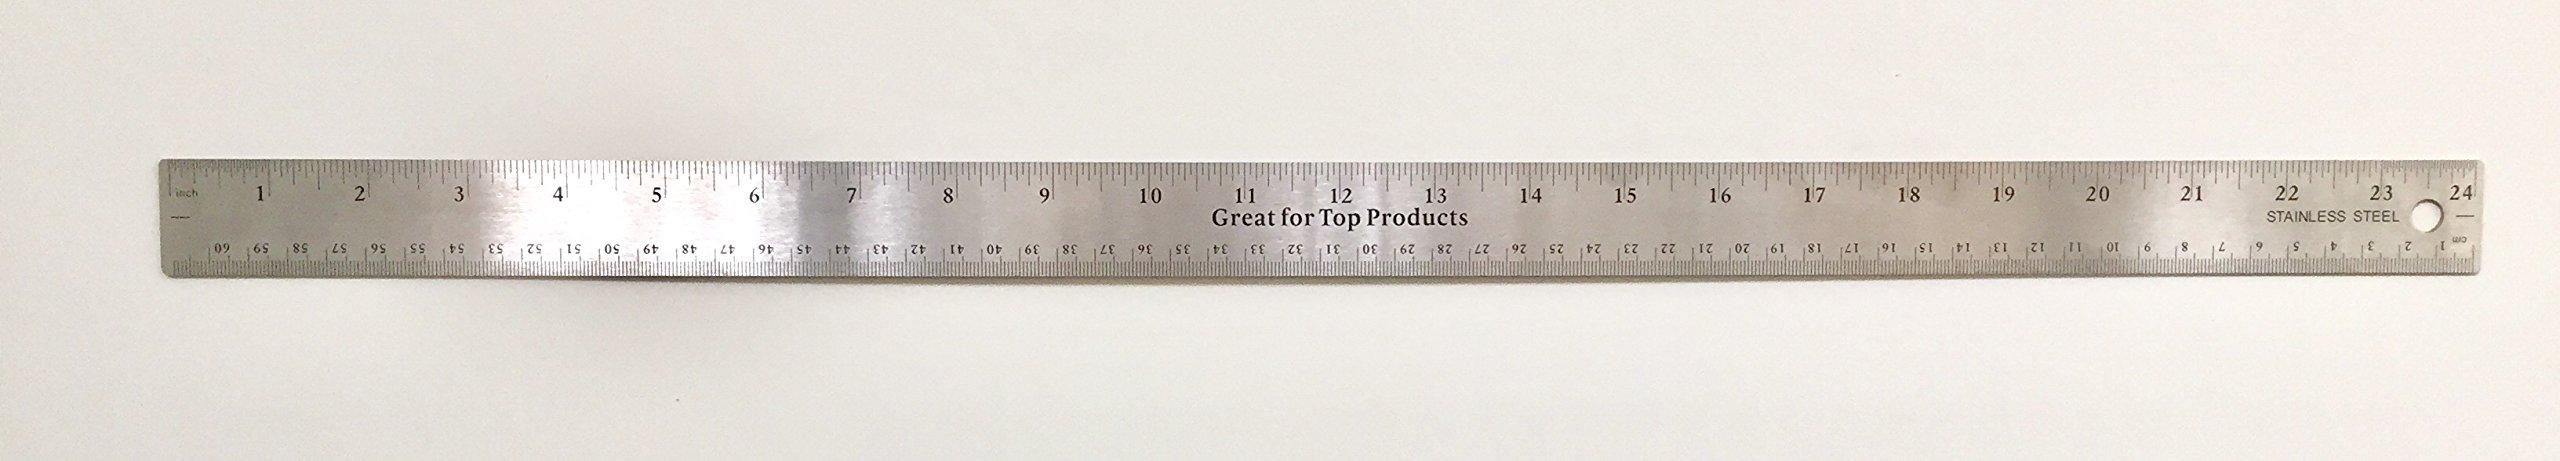 GTP Metal Stainless Steel Ruler 24 inches metric With Slip Cork Base - BULK (144 each 24'')